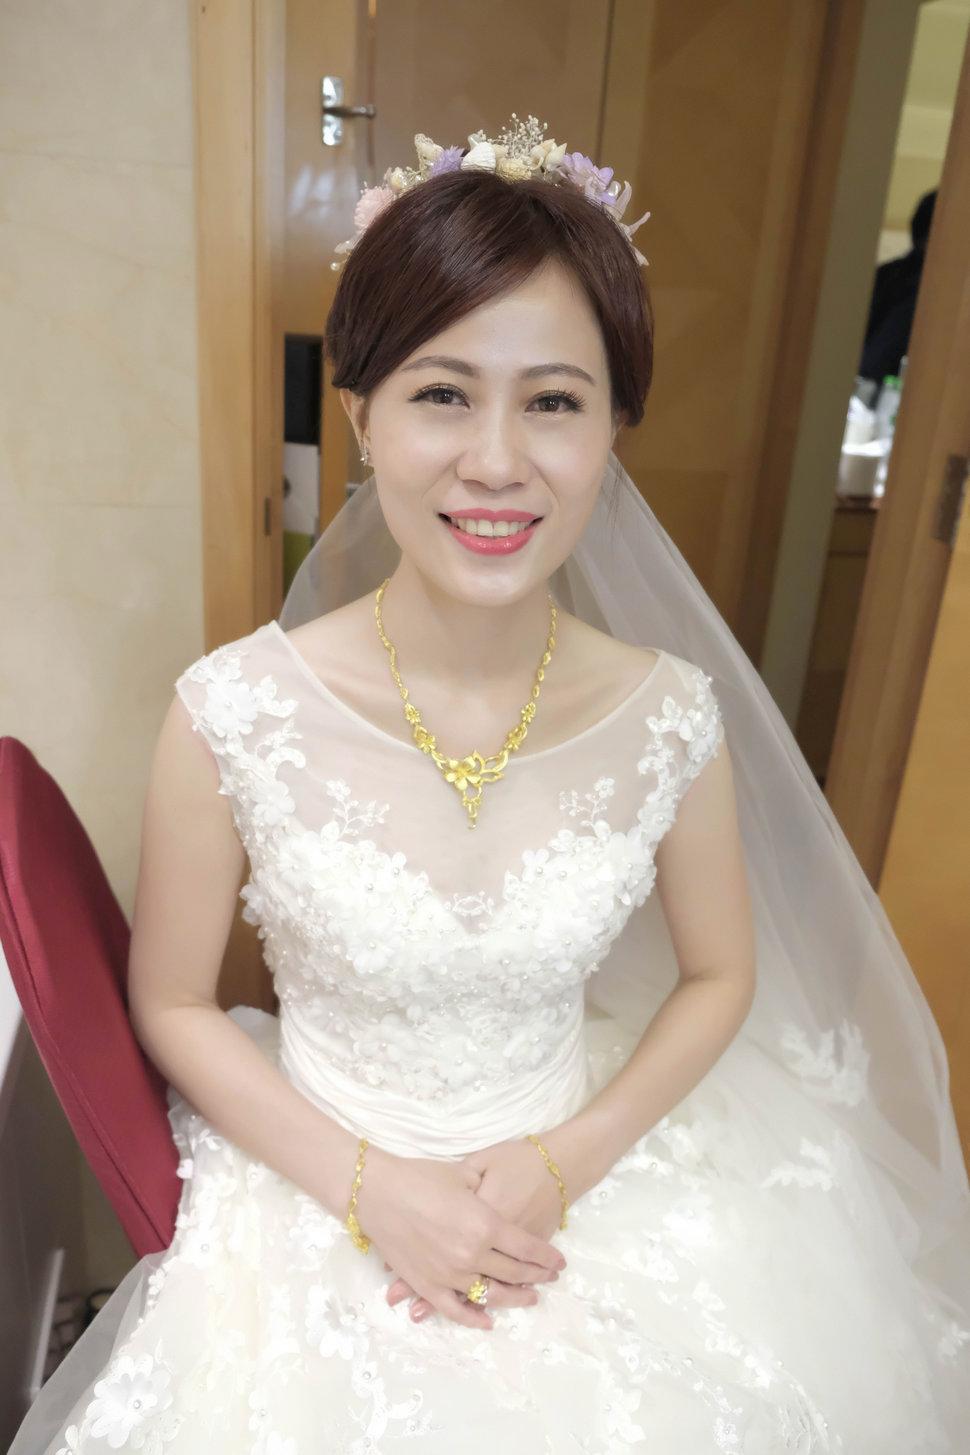 DSCF8213 - 新娘秘書 Yumi陳竹竹 造型工作室 - 結婚吧